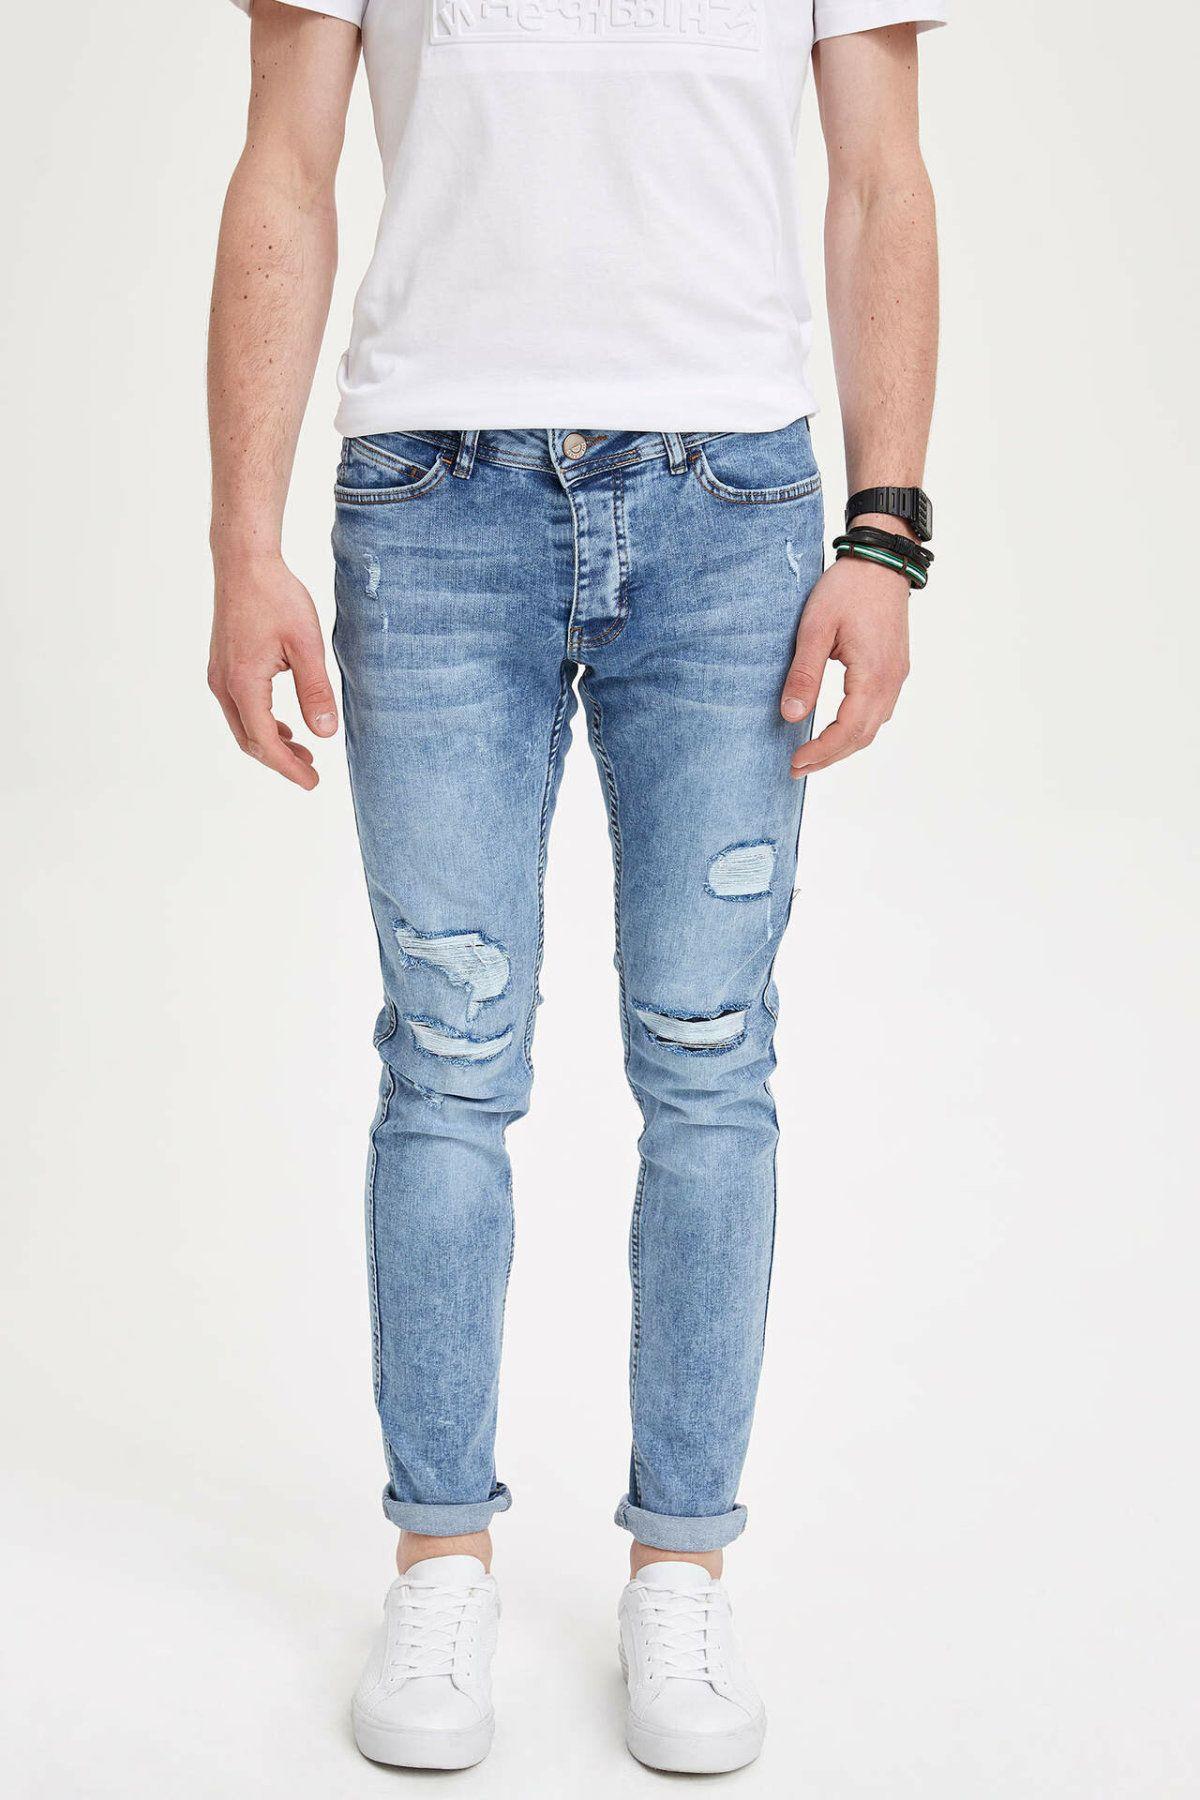 Defacto Erkek Moda Delik Açık Mavi Basit Pantolon Casual Klasik İnce Denim Jeans Casual Esneklik Pantolon Erkek -L6096AZ19SM